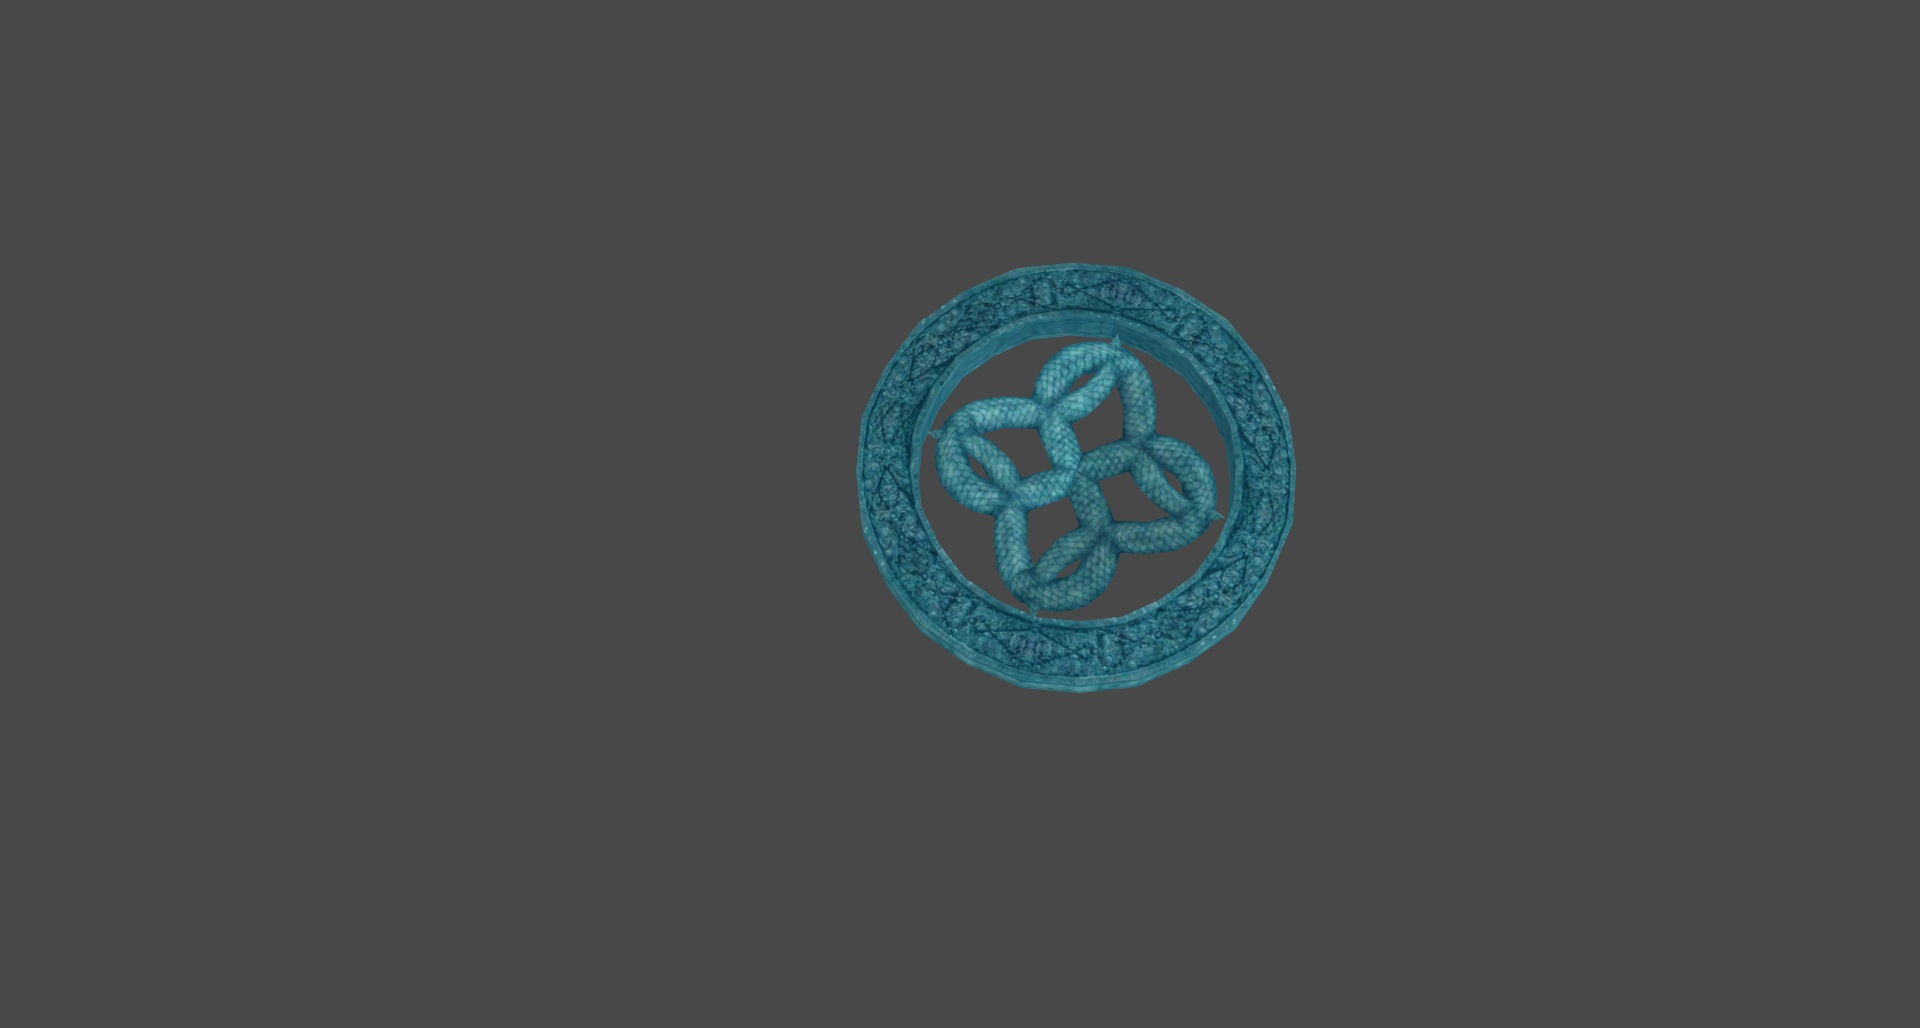 Resident Evil 6 Serpent Emblem